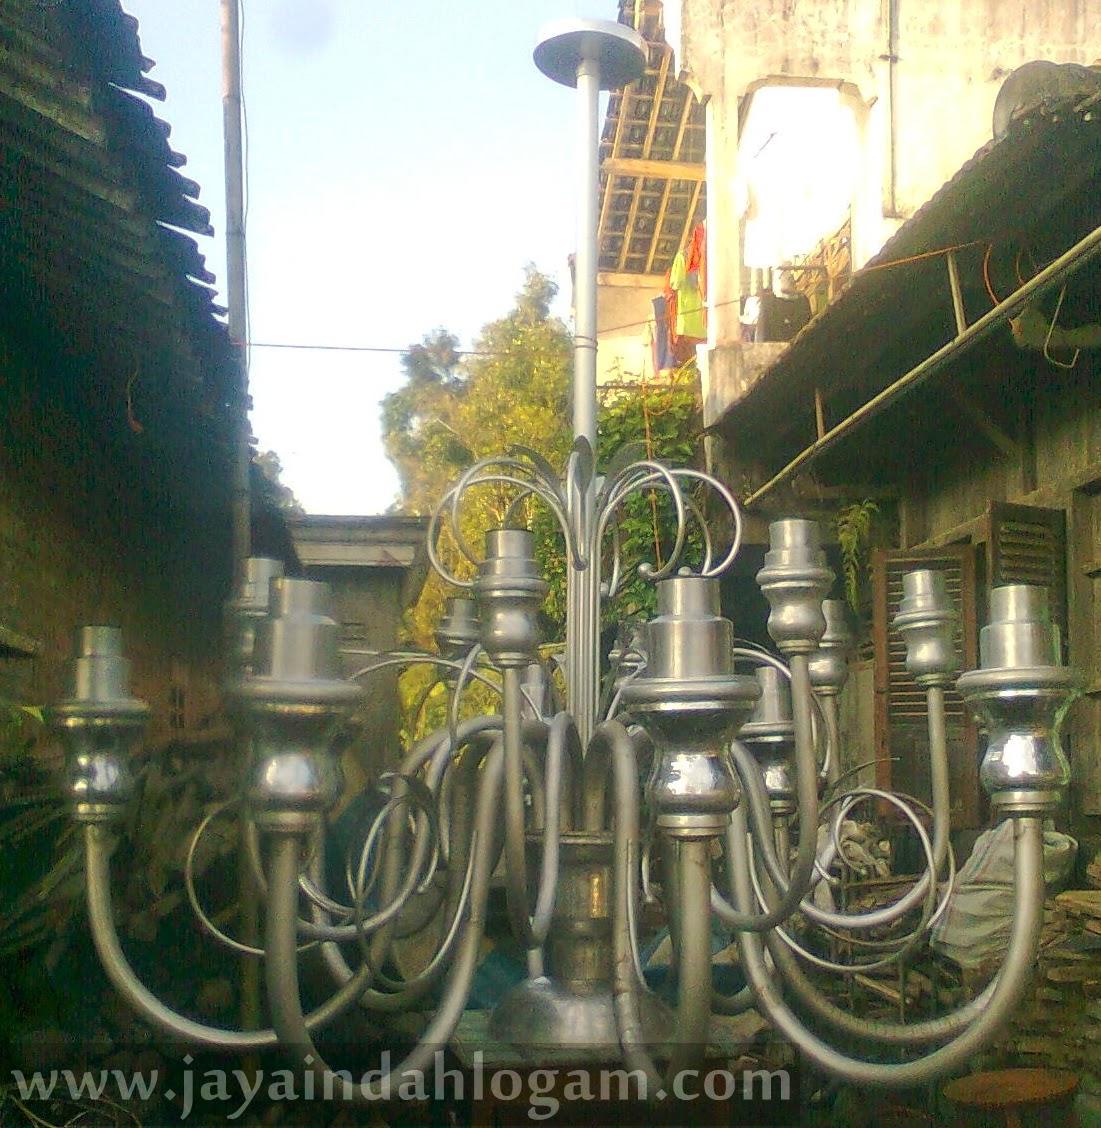 http://www.jayaindahlogam.com/2014/08/lampu-robyong-alumunium.html